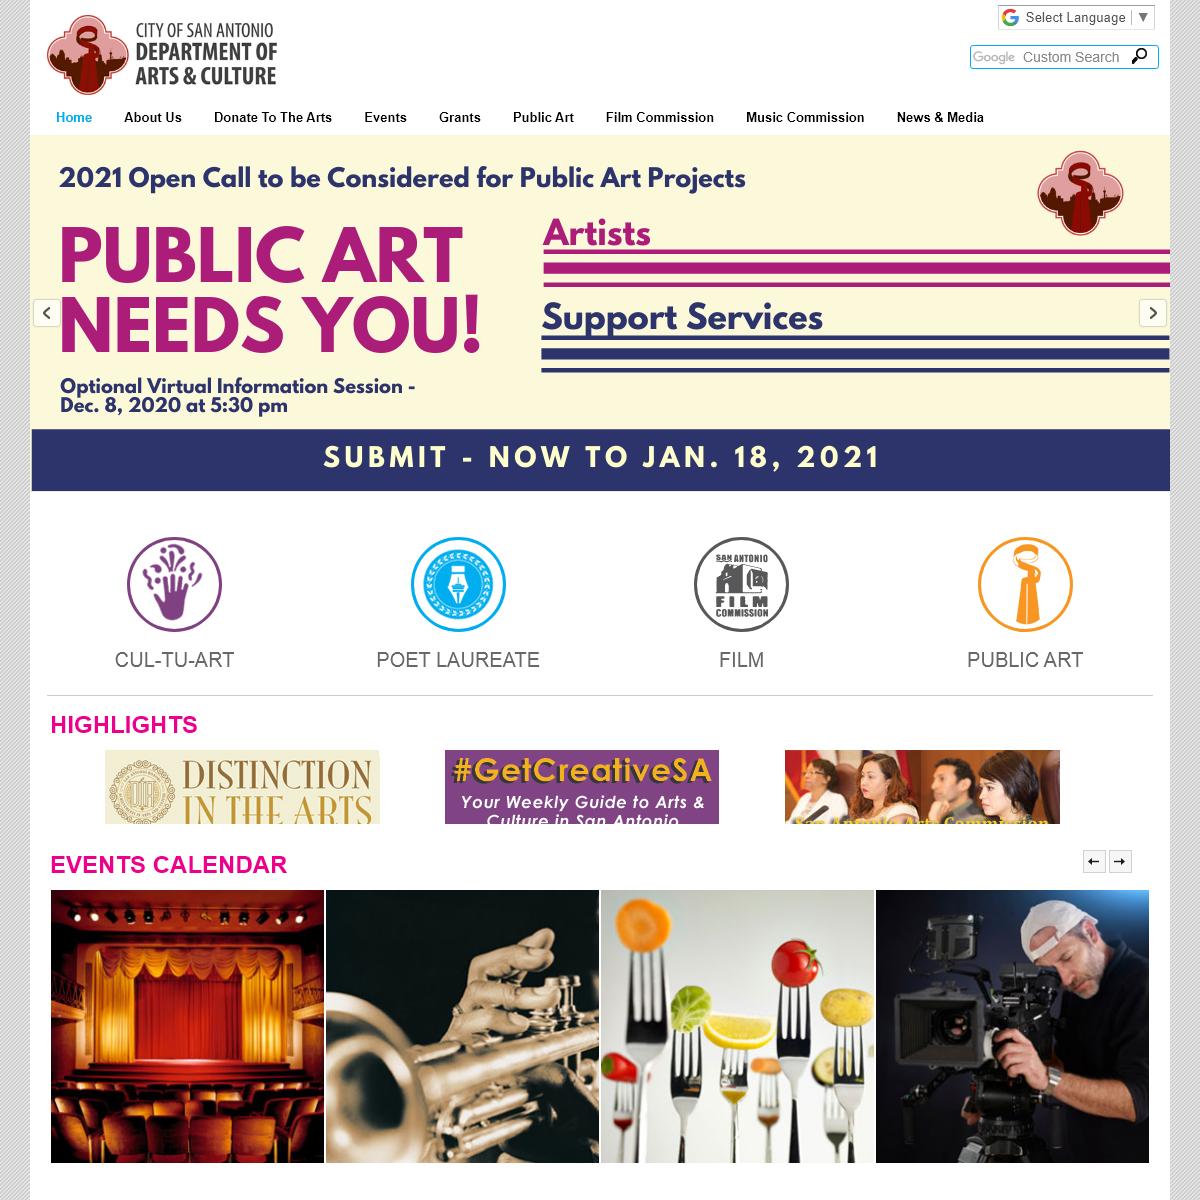 Get Creative San Antonio - City of San Antonio - Texas - GetCreativeSanAntonio.com